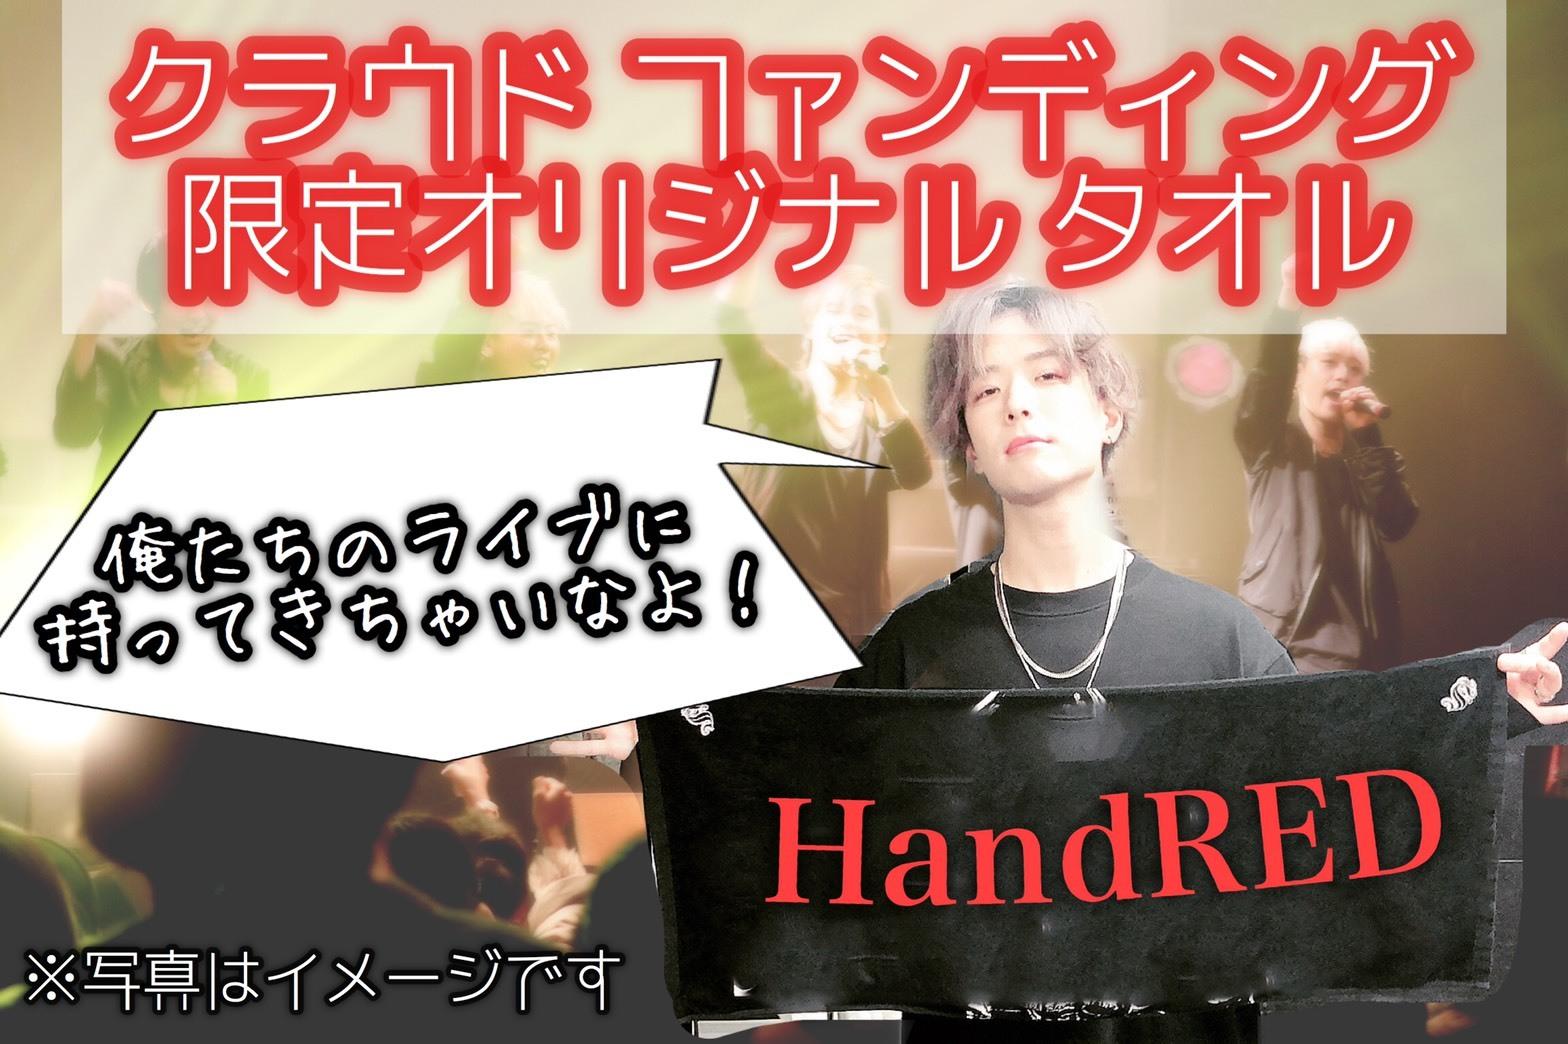 <HandRED限定オリジナルデザイングッズプラン>